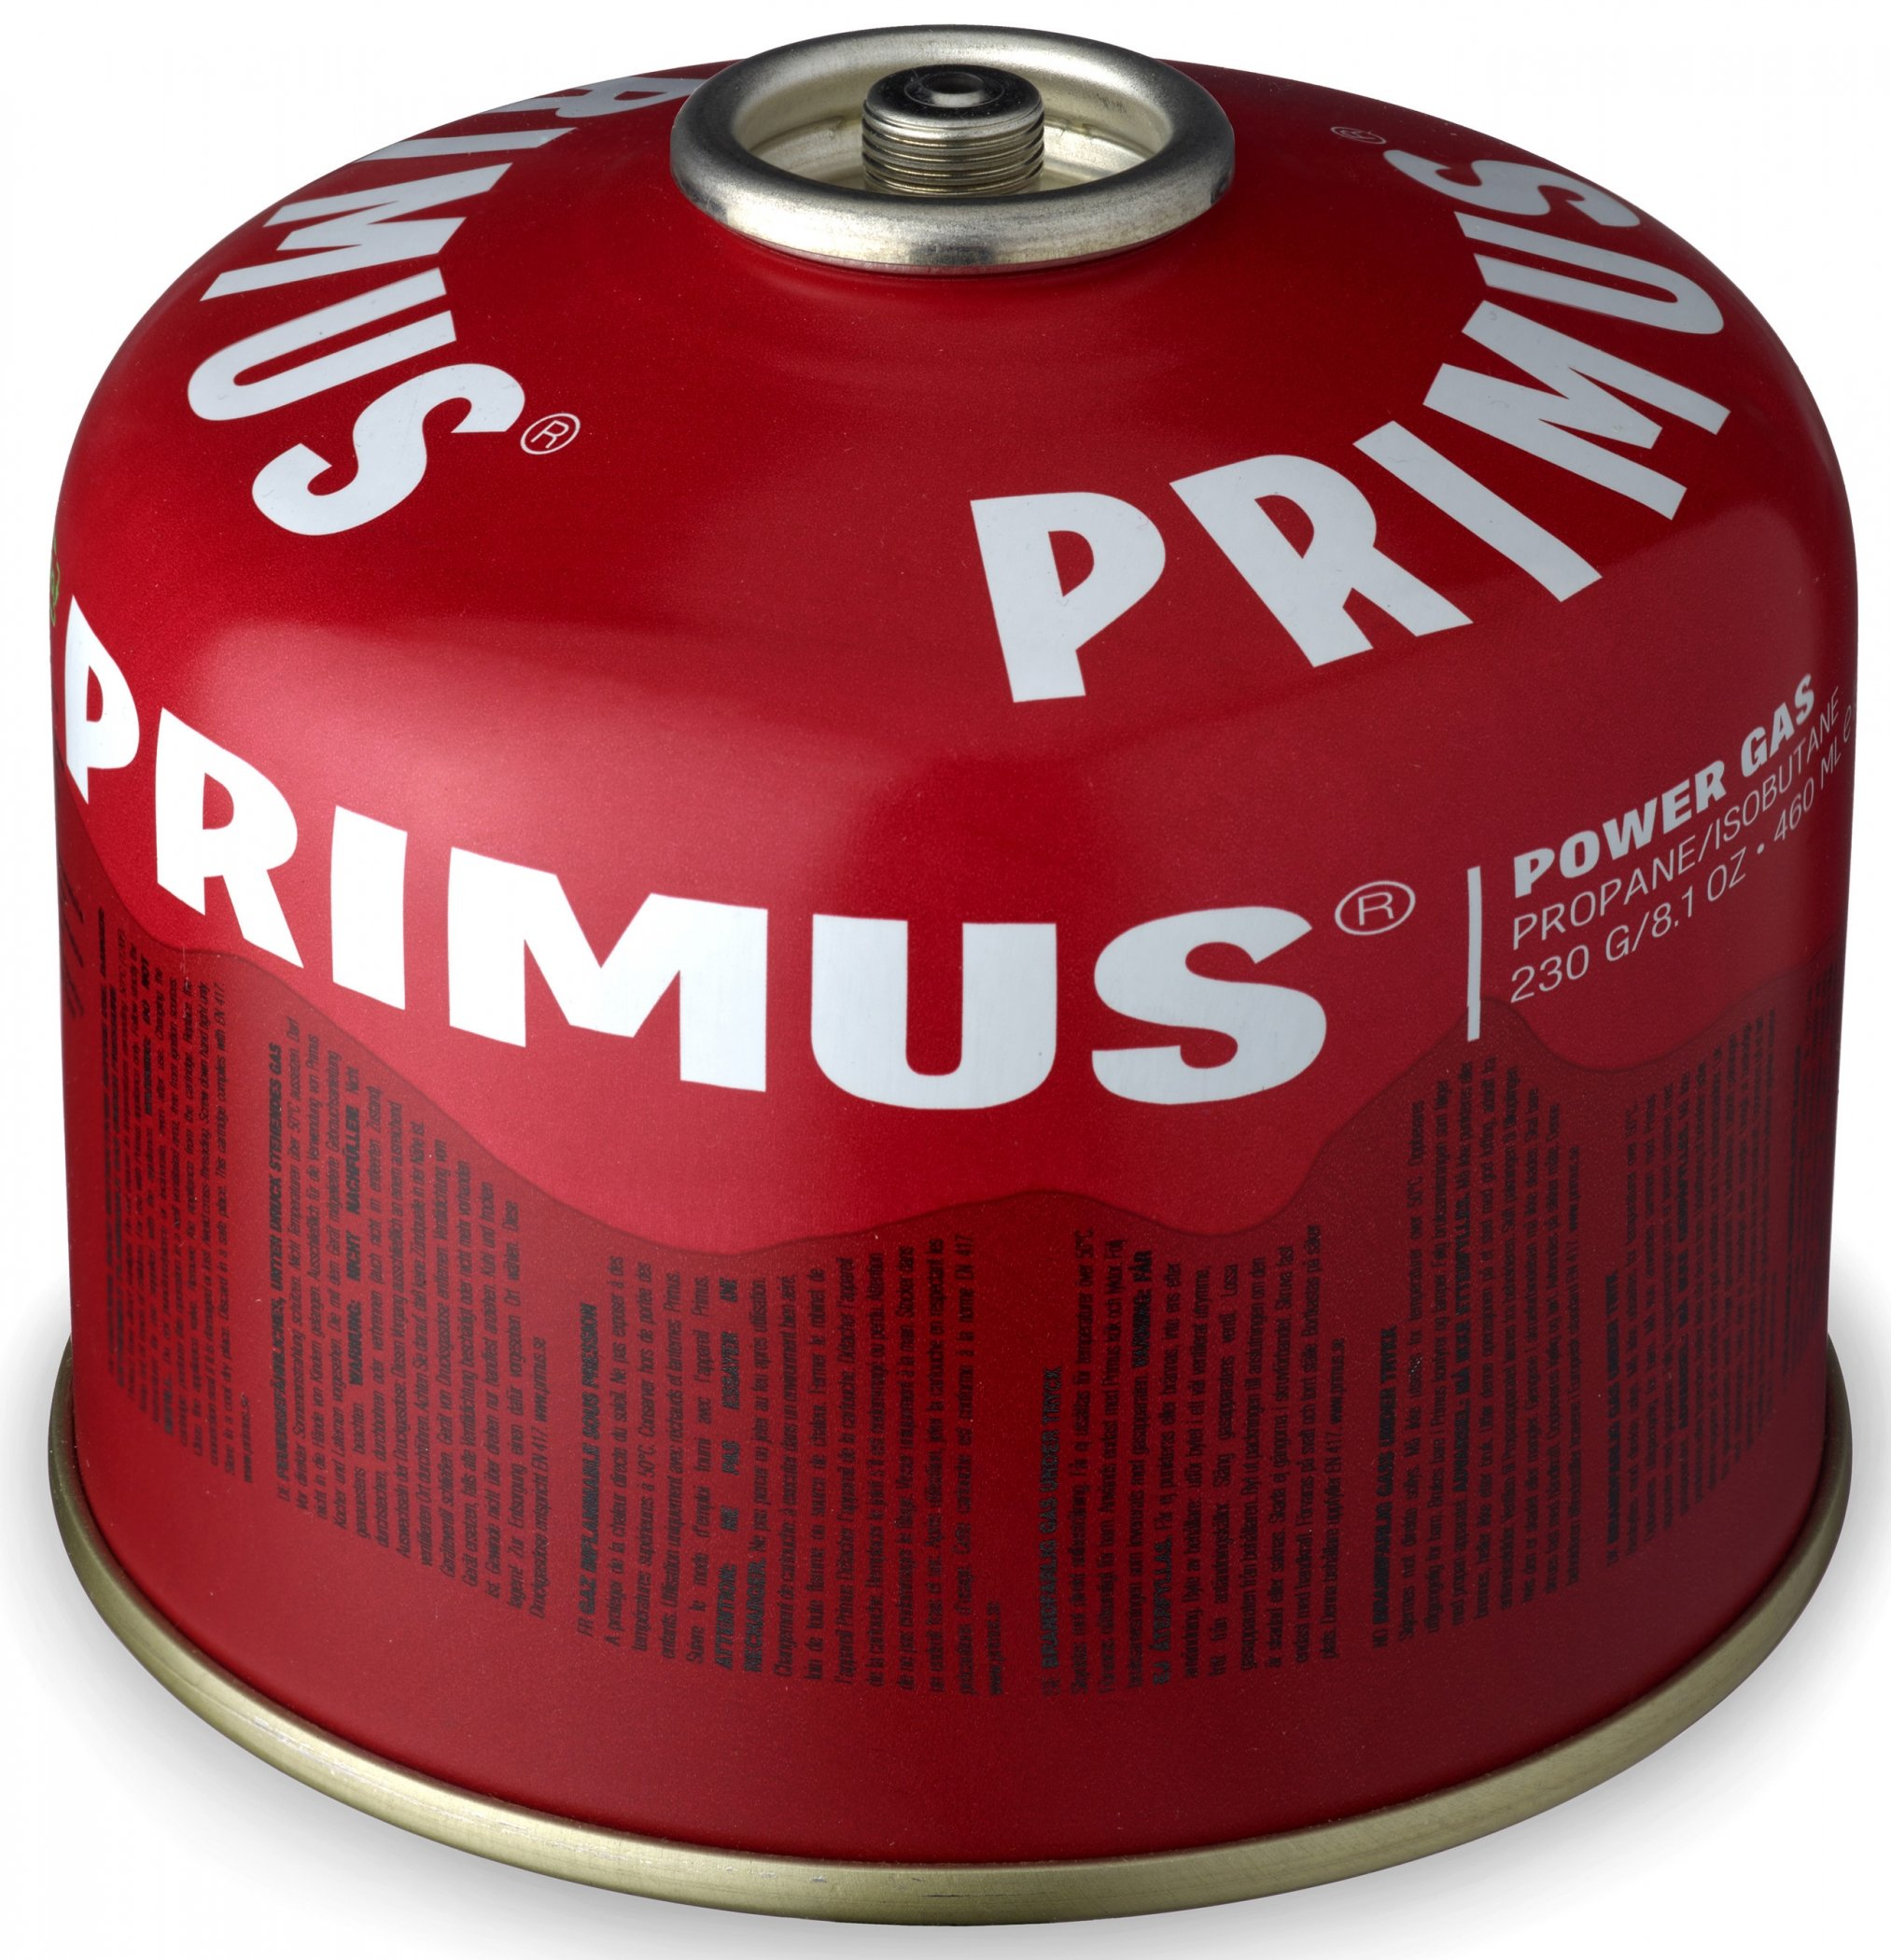 Relags-Primus-Power-Gas-VtlKart-230g